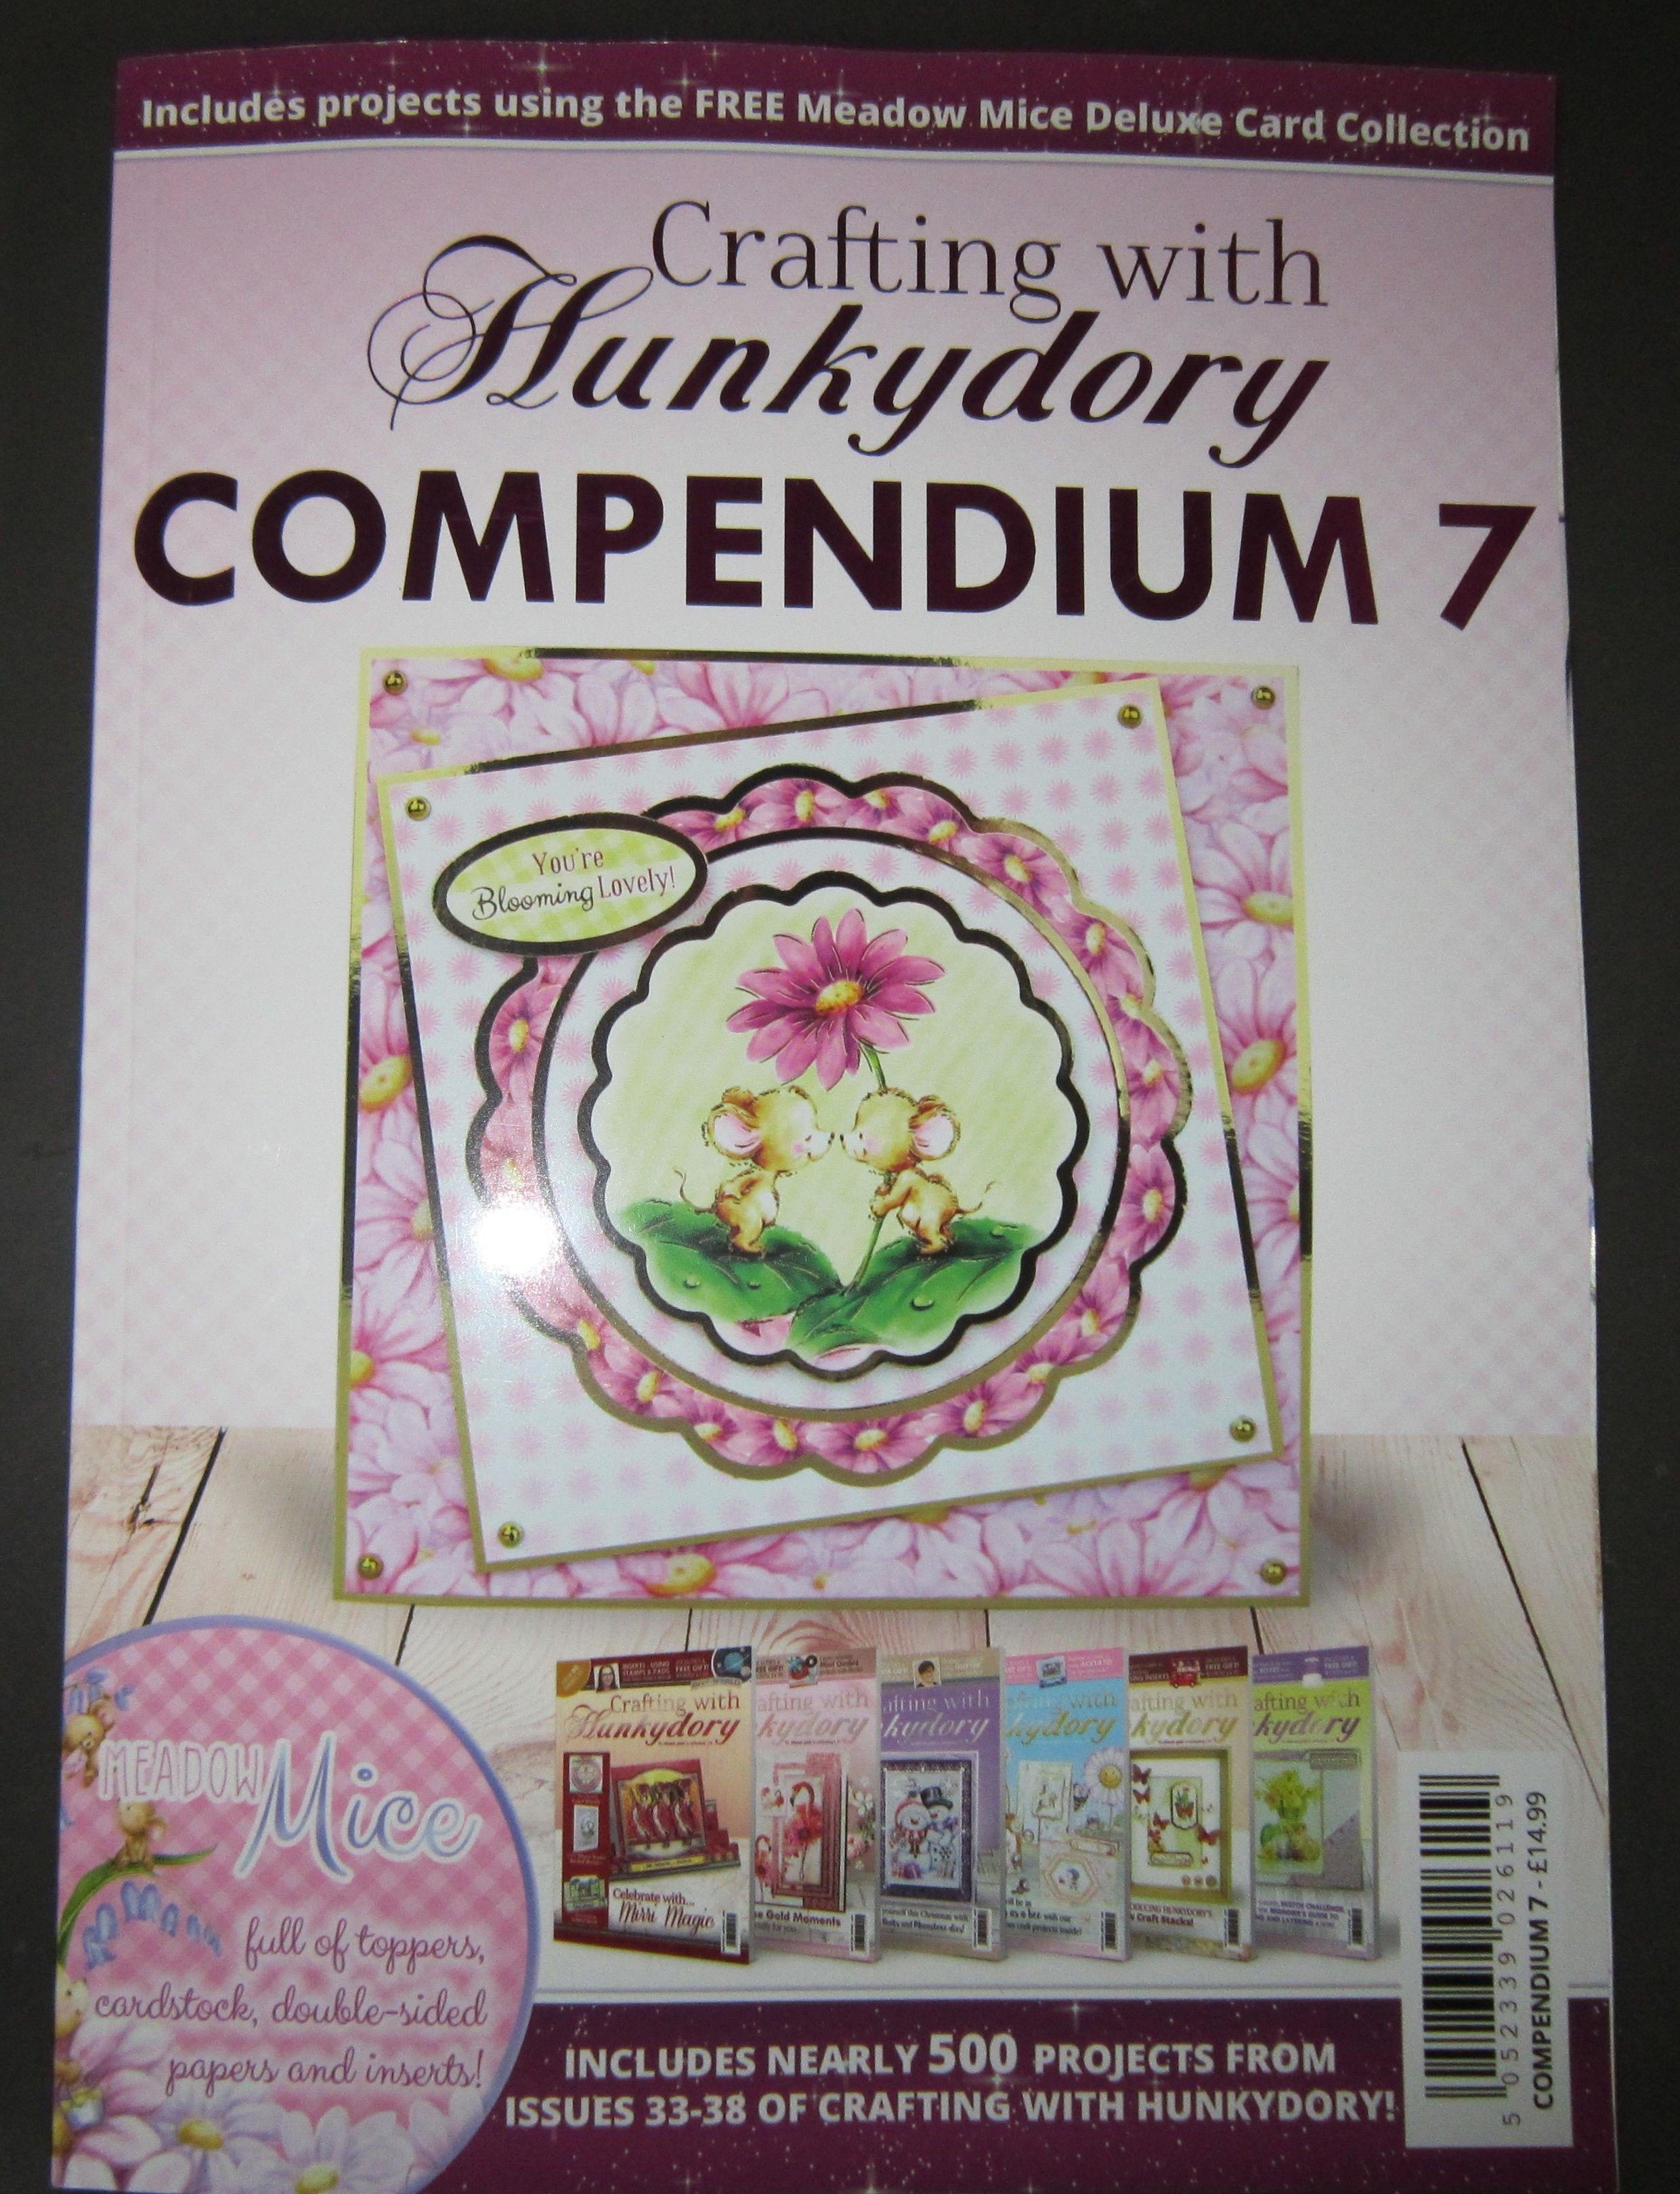 Hunkydory Crafting with Hunkydory Compendium 7